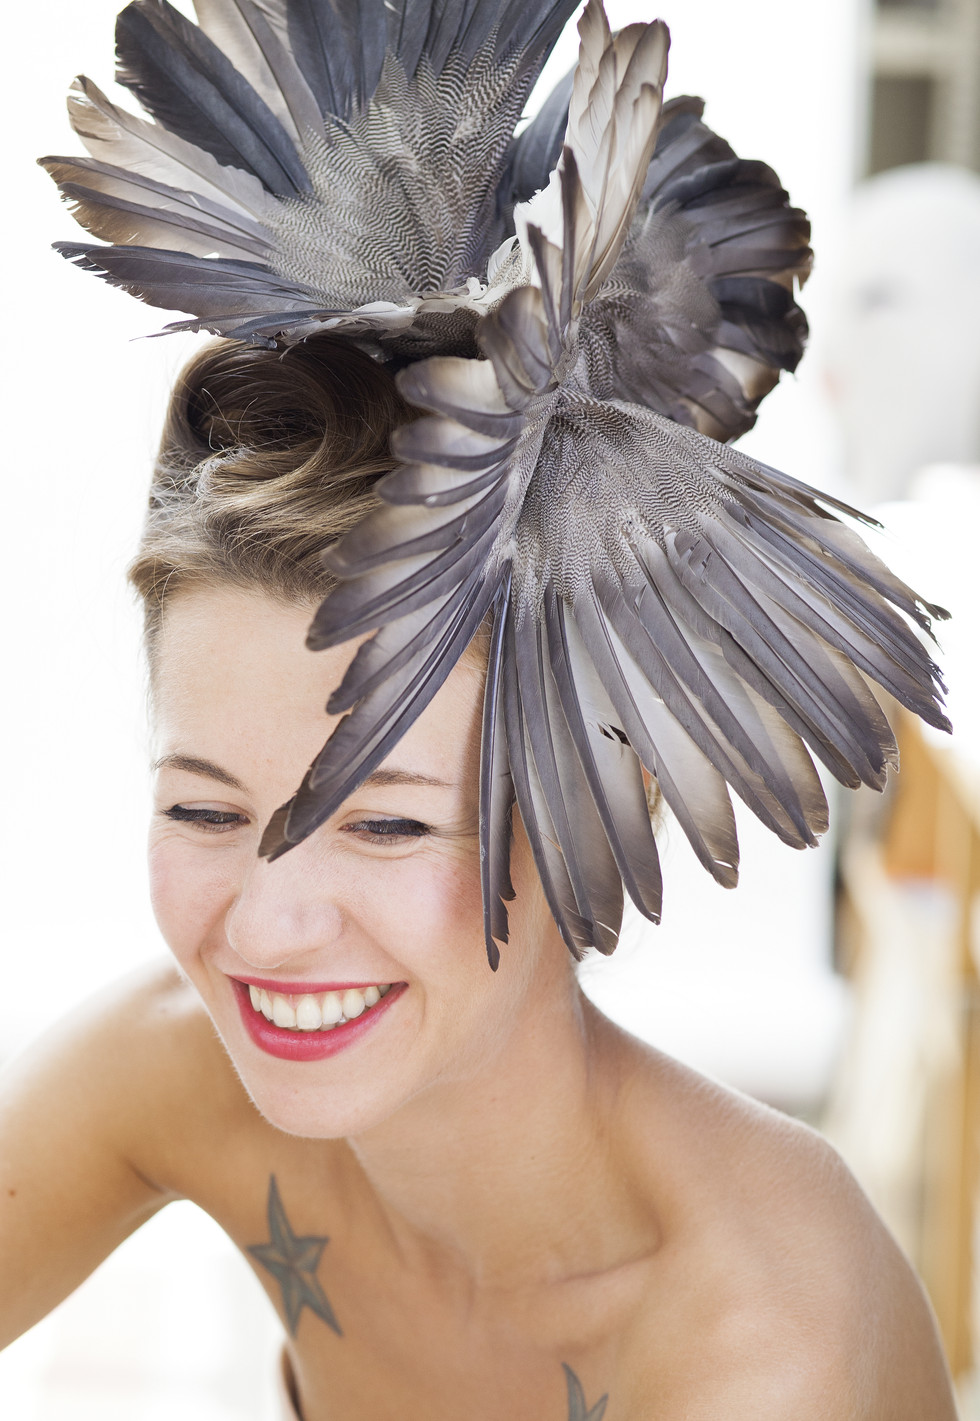 BIRDS IN THE HEAD